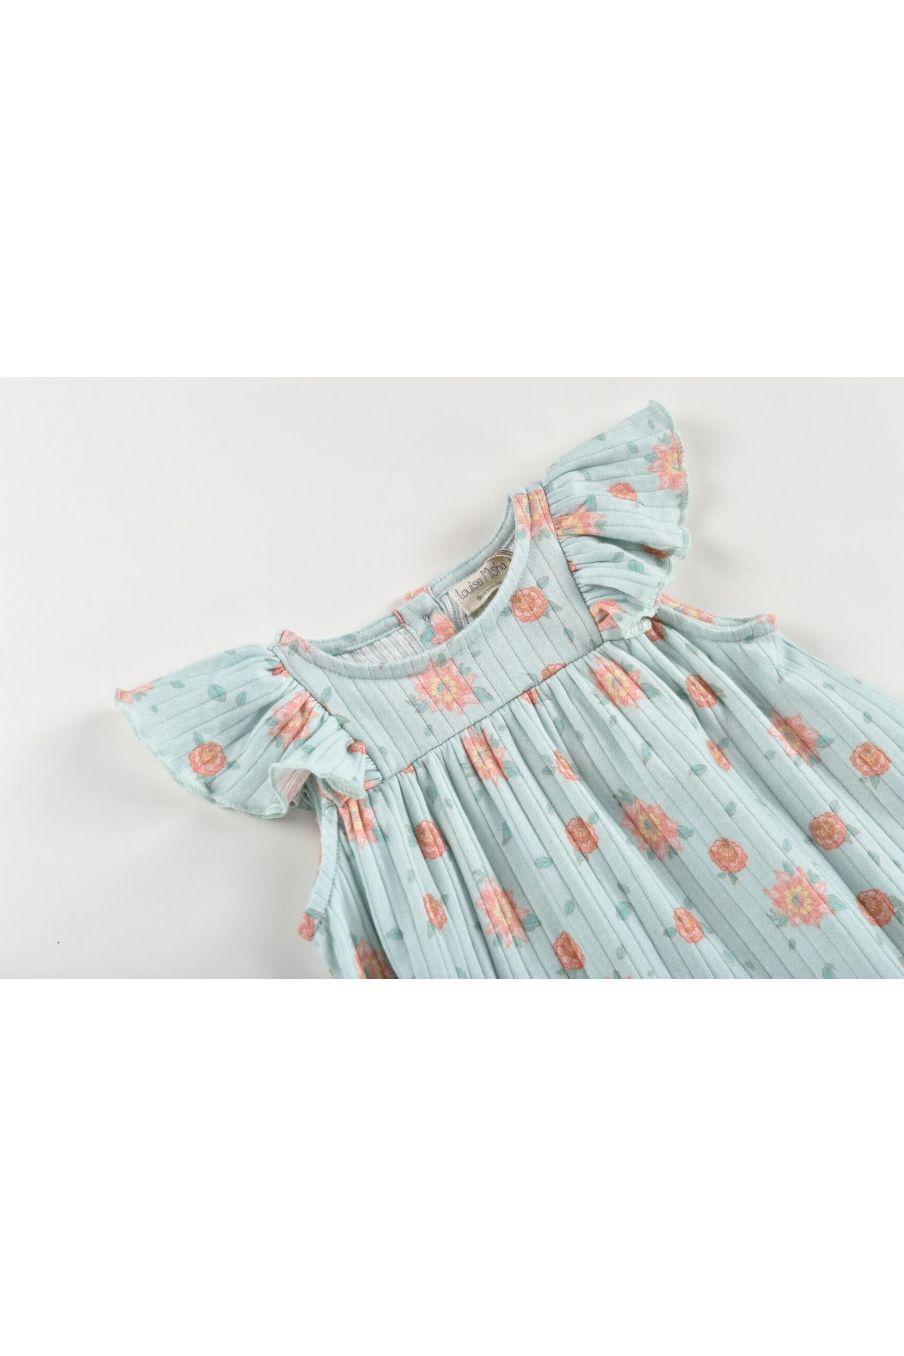 boheme chic vintage robe fille amita vintage blue flowers